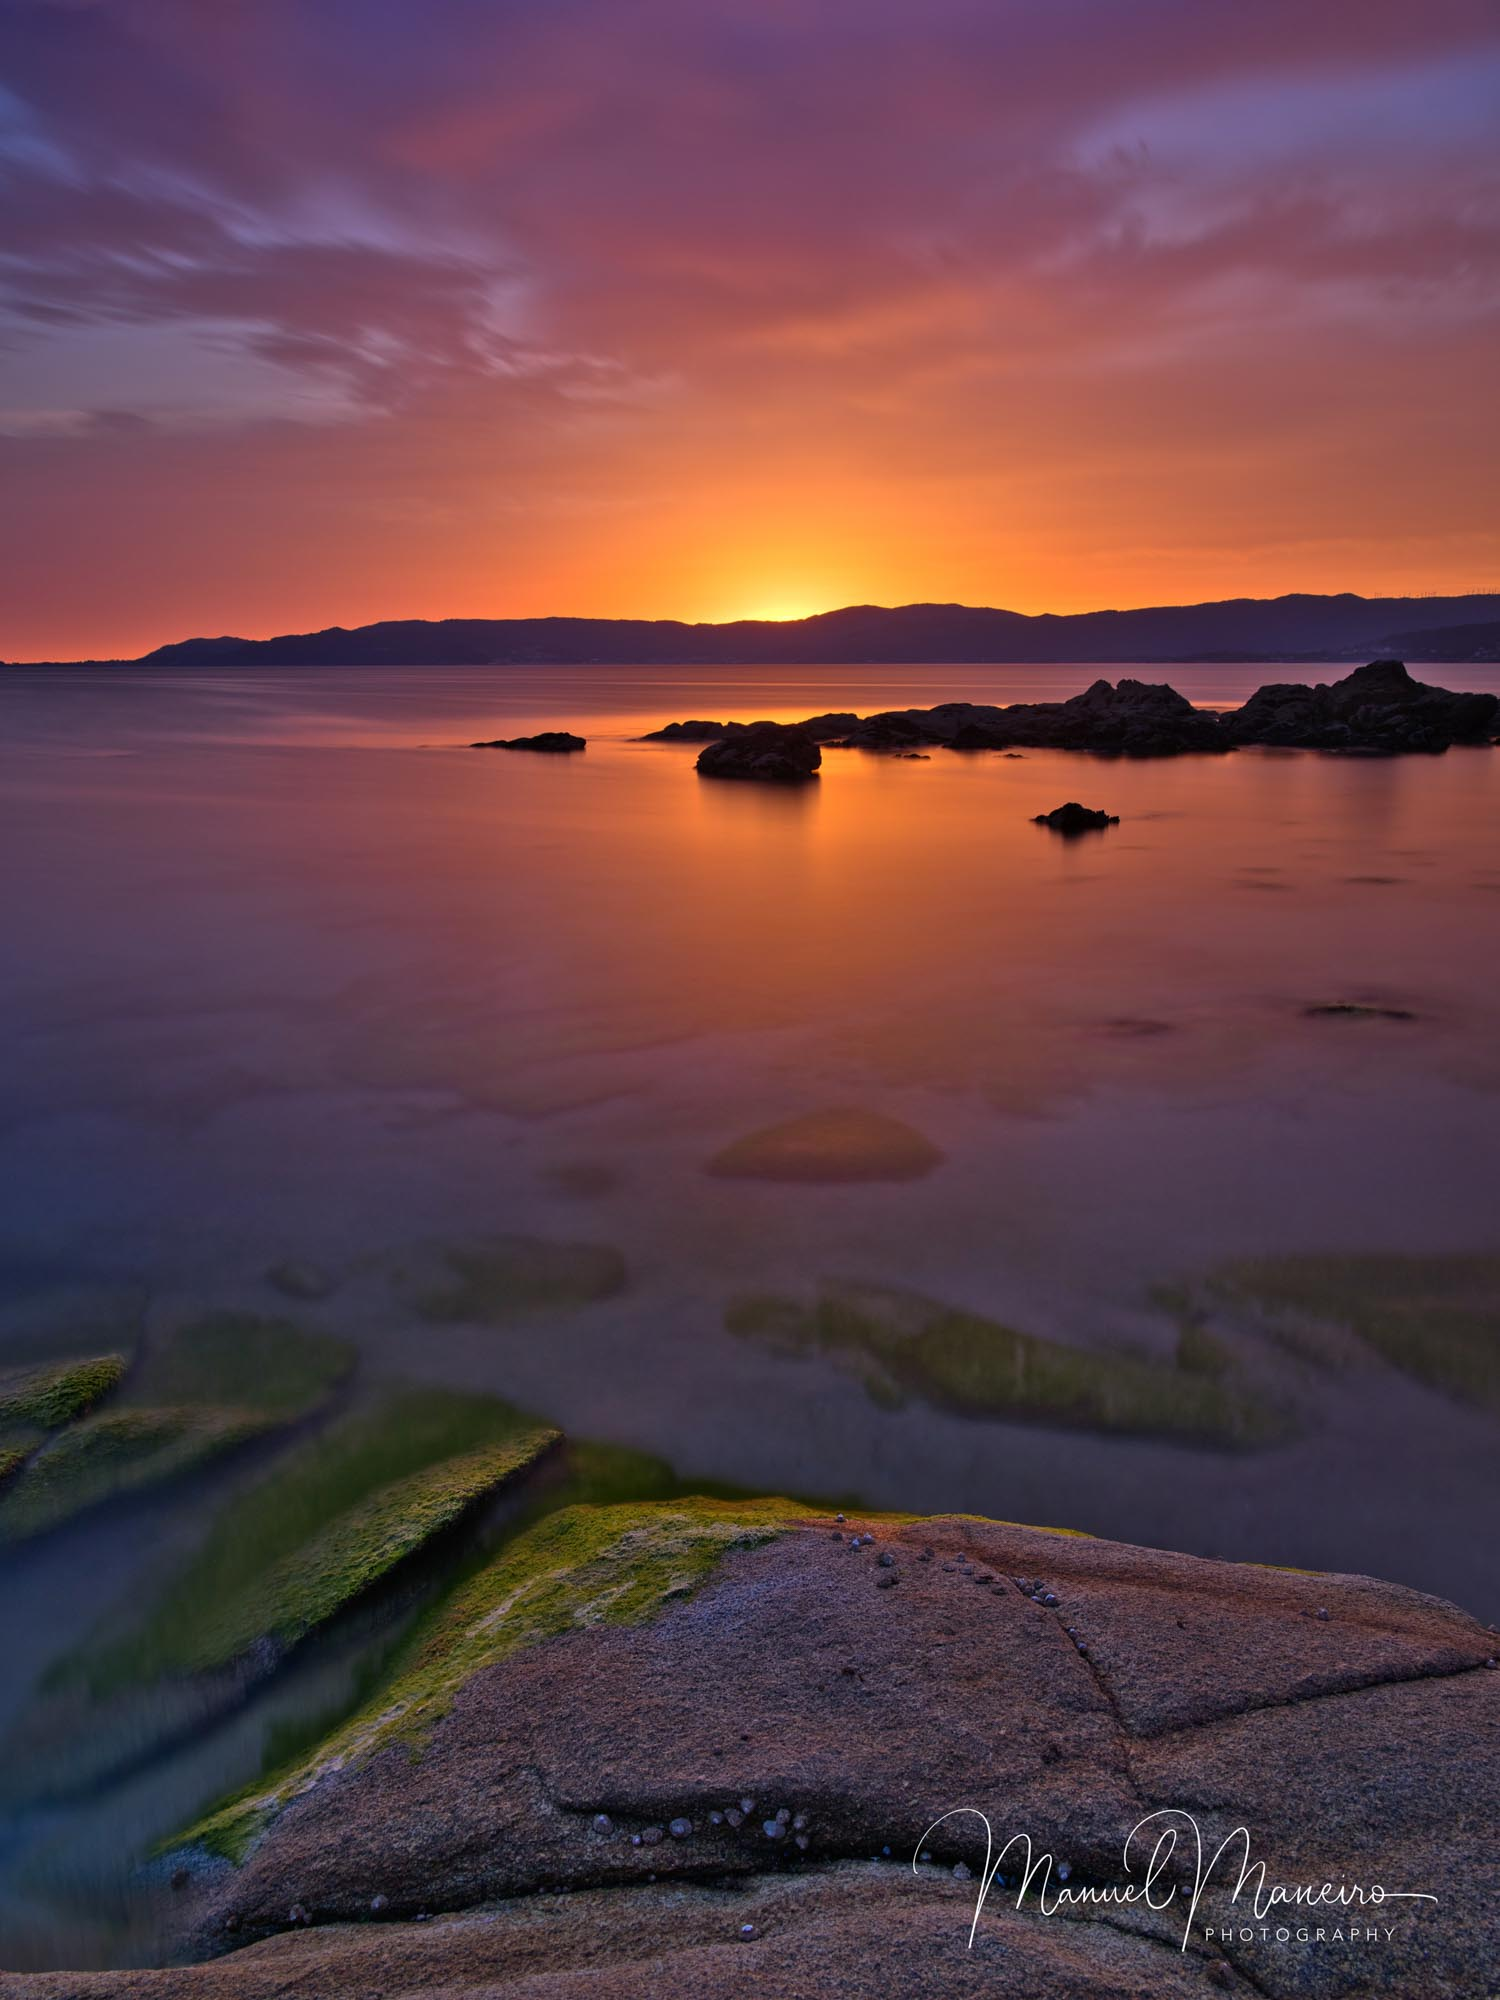 0245 Sunset Seascape Photography ©Manuel Maneiro